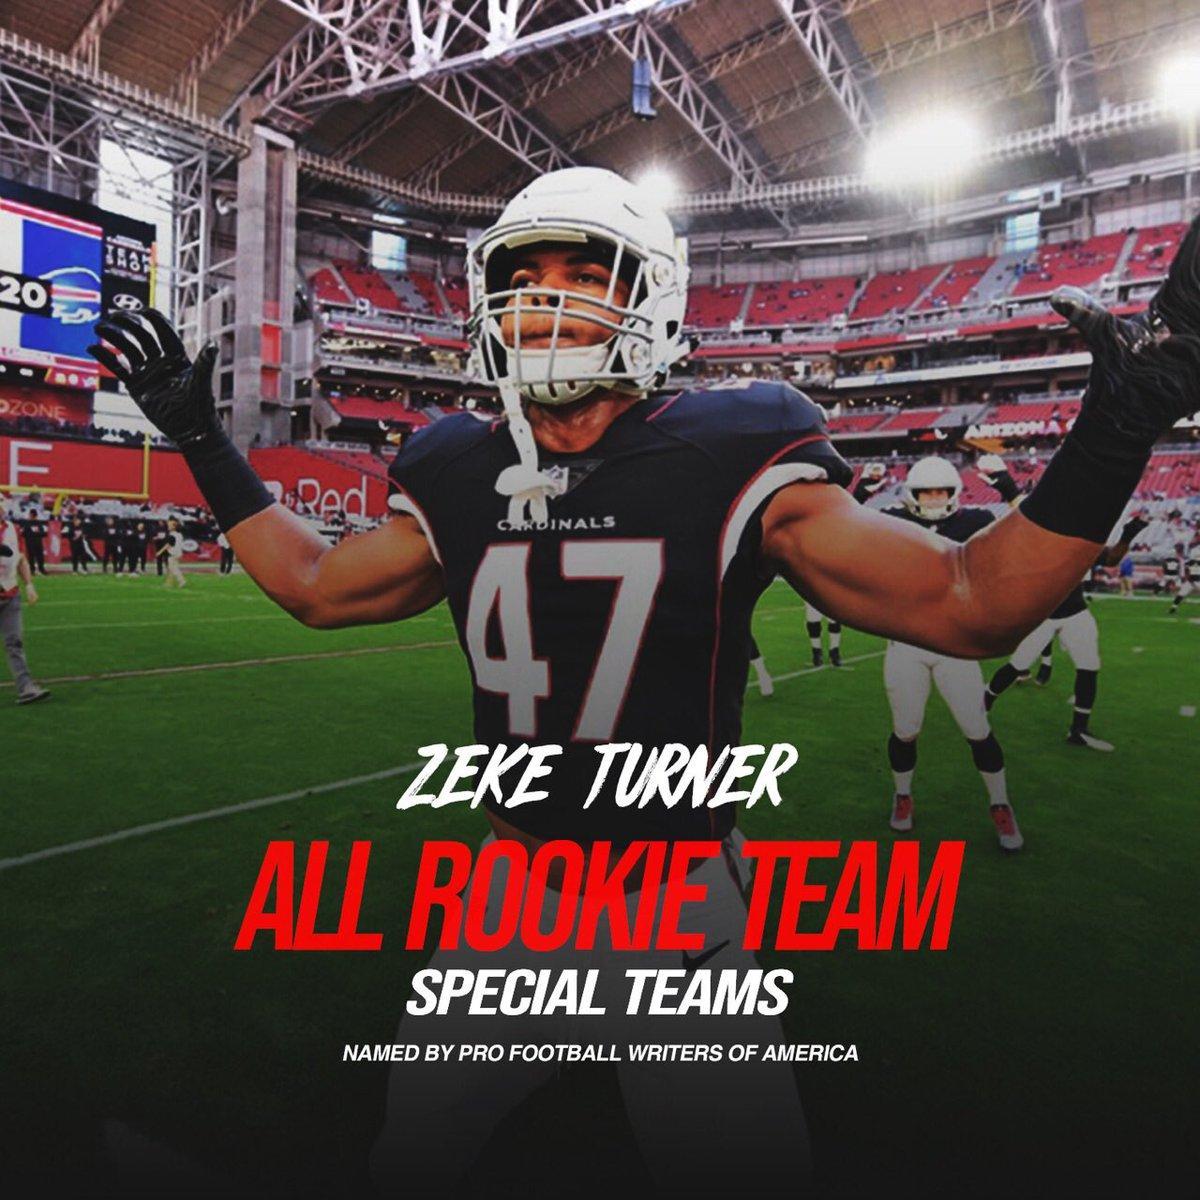 best service 87b9c 22943 Ezekiel Turner - @zeke_turner Twitter Analytics - Trendsmap